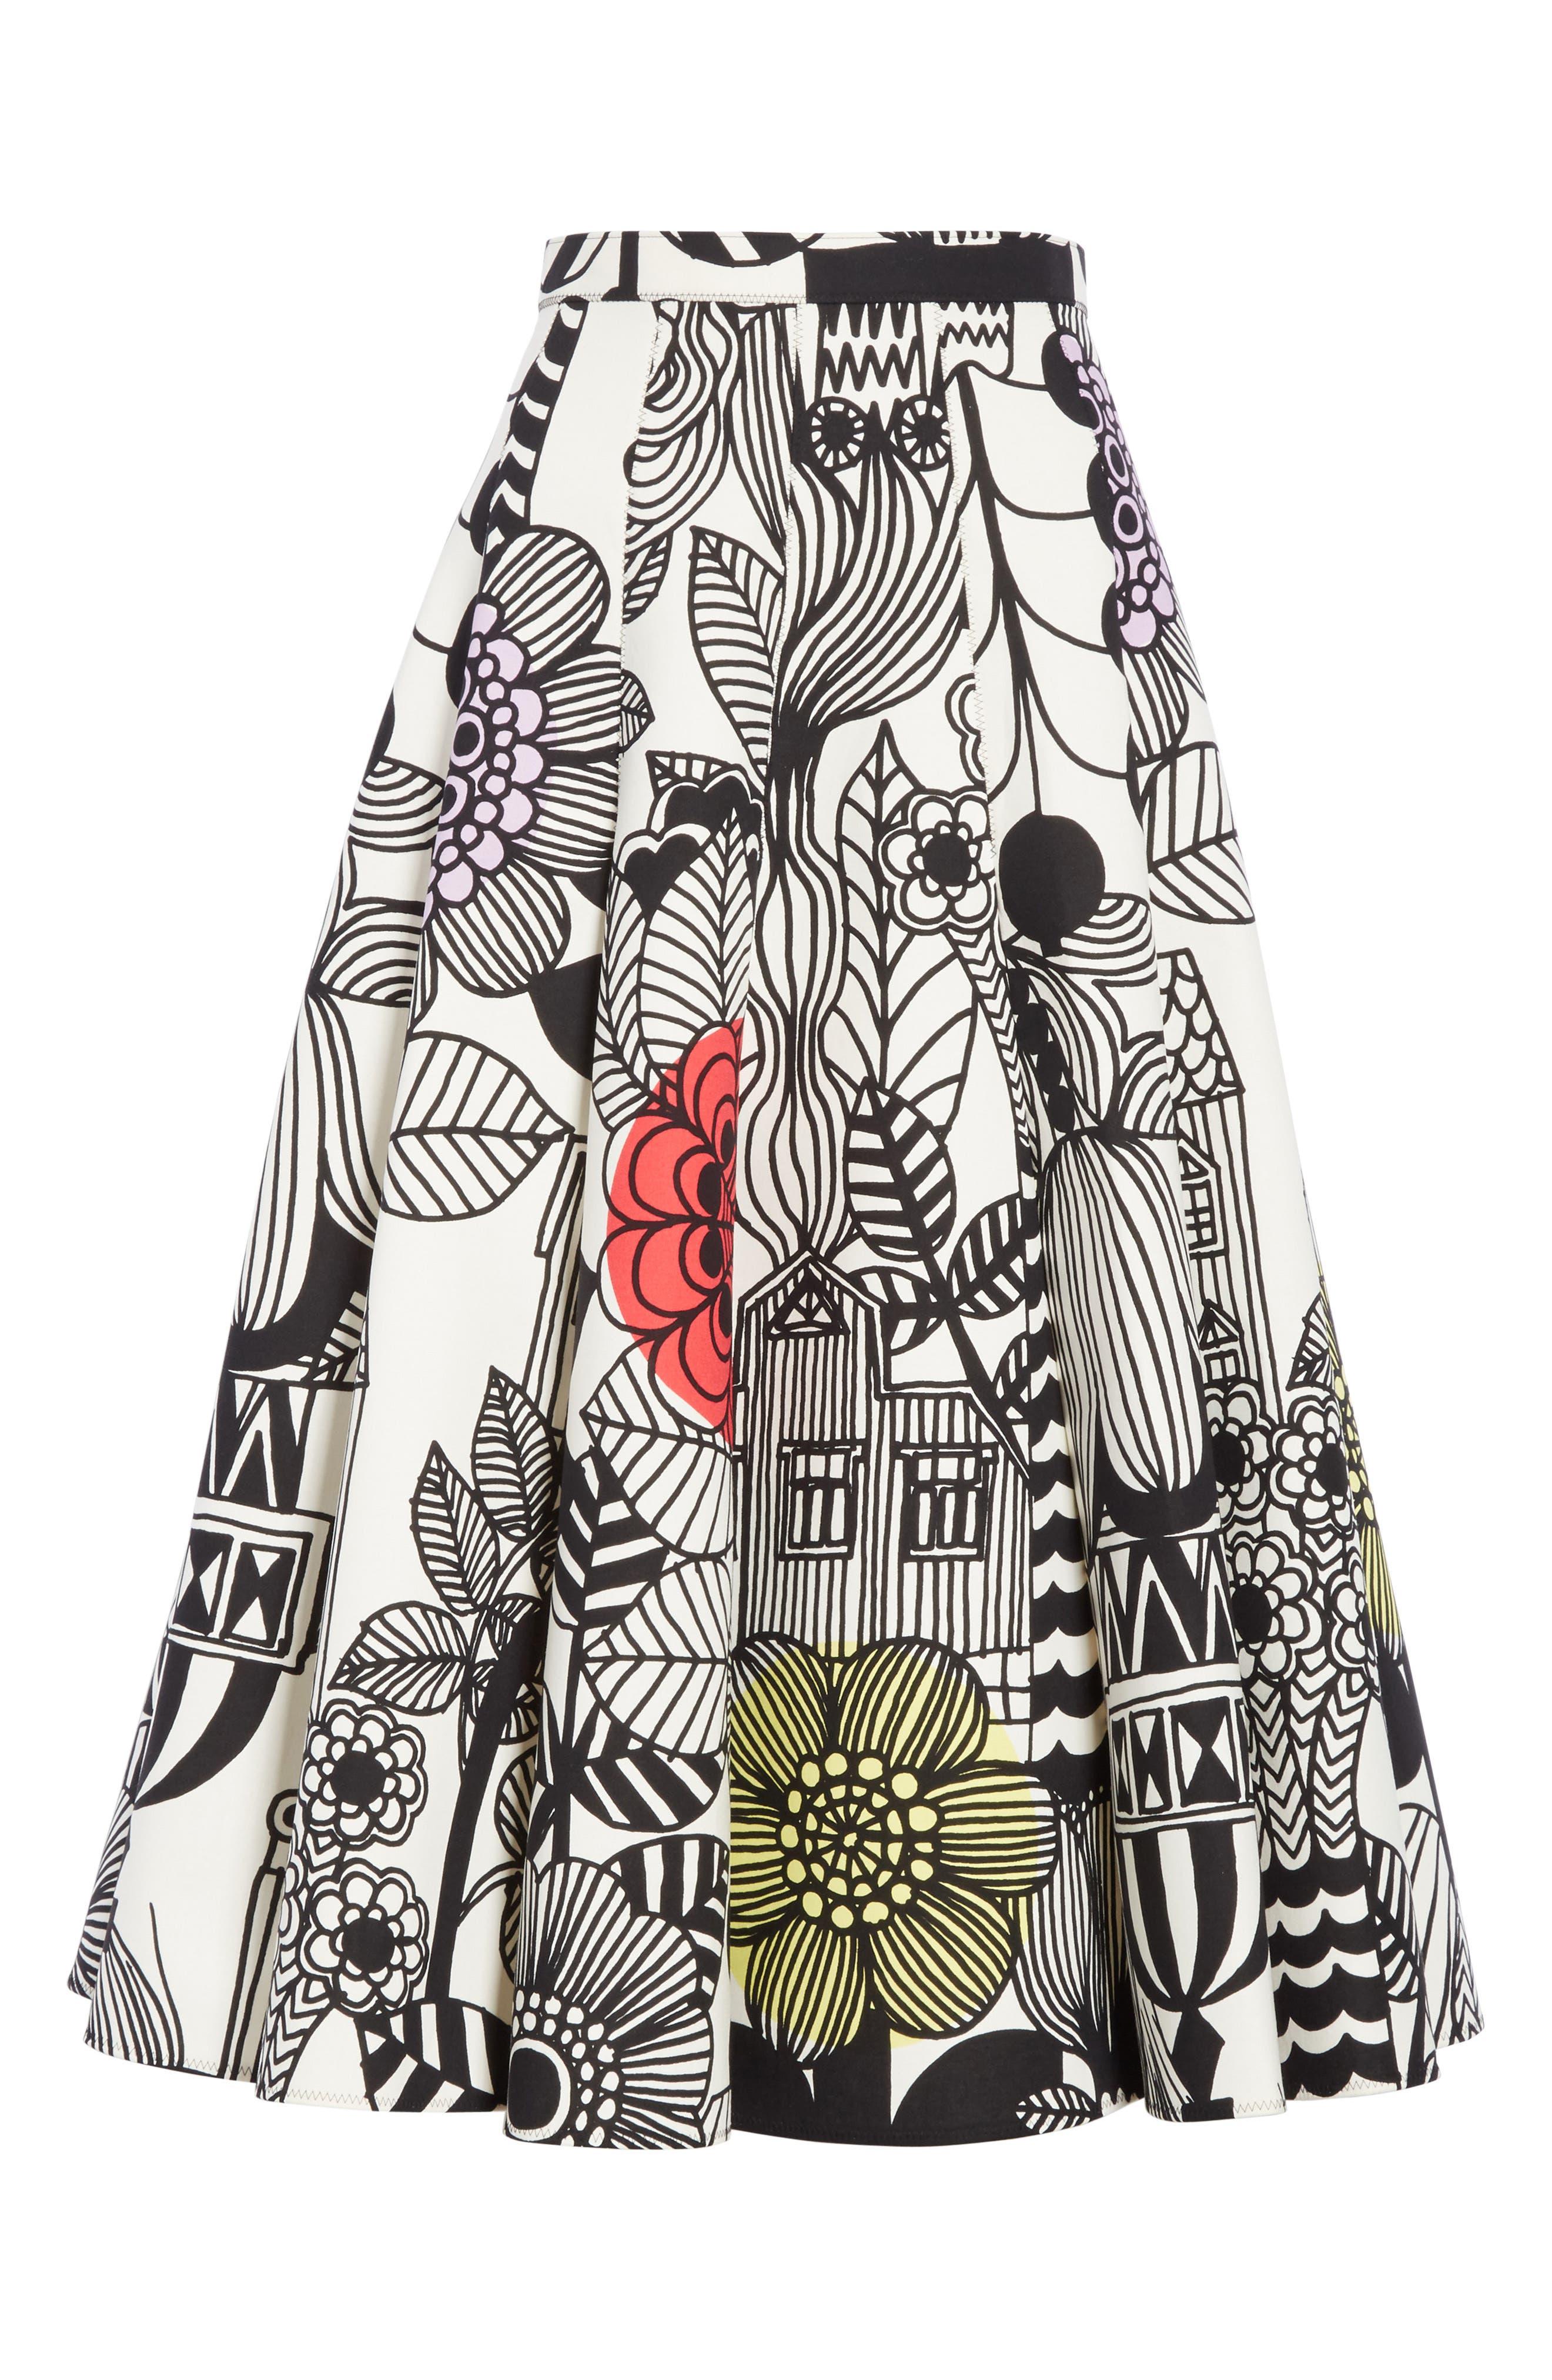 x Marimekko Vegetable Print Cotton Skirt,                             Alternate thumbnail 6, color,                             100